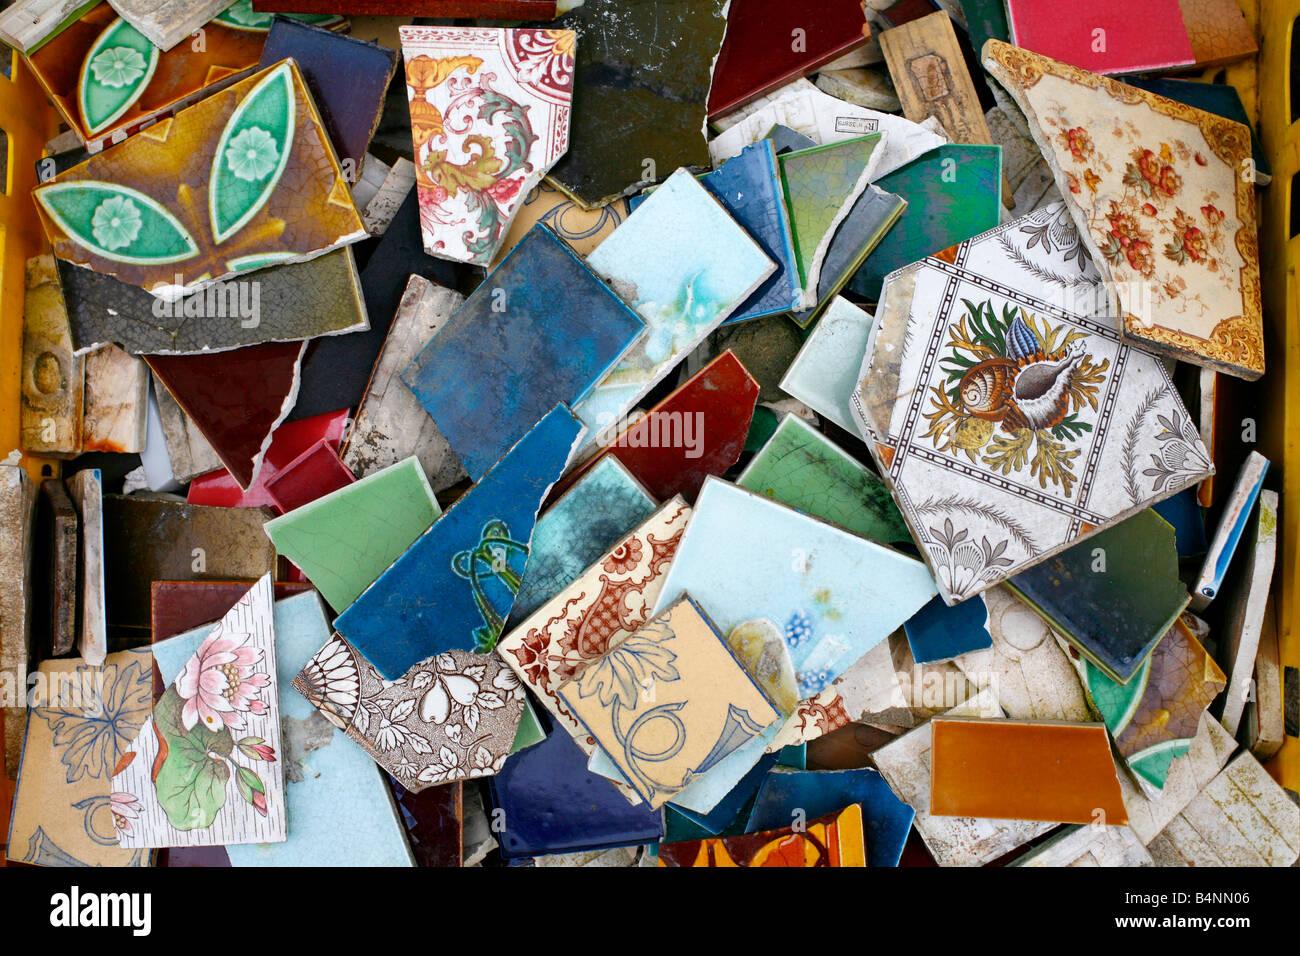 A box of antique ceramic tiles - Stock Image